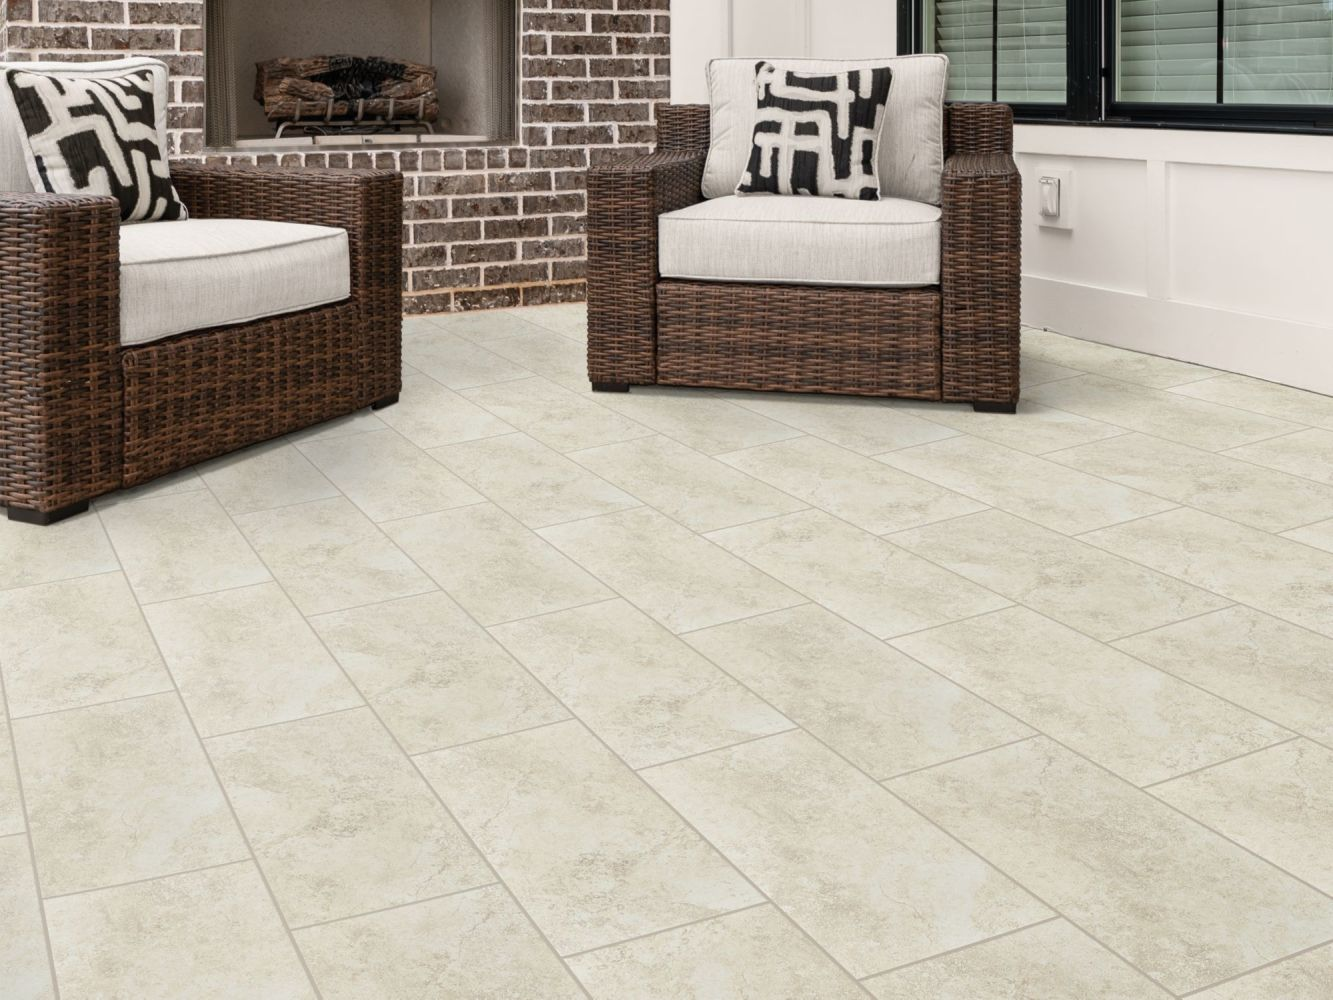 Shaw Floors Ceramic Solutions Jackson 12×24 Sand 00200_257TS